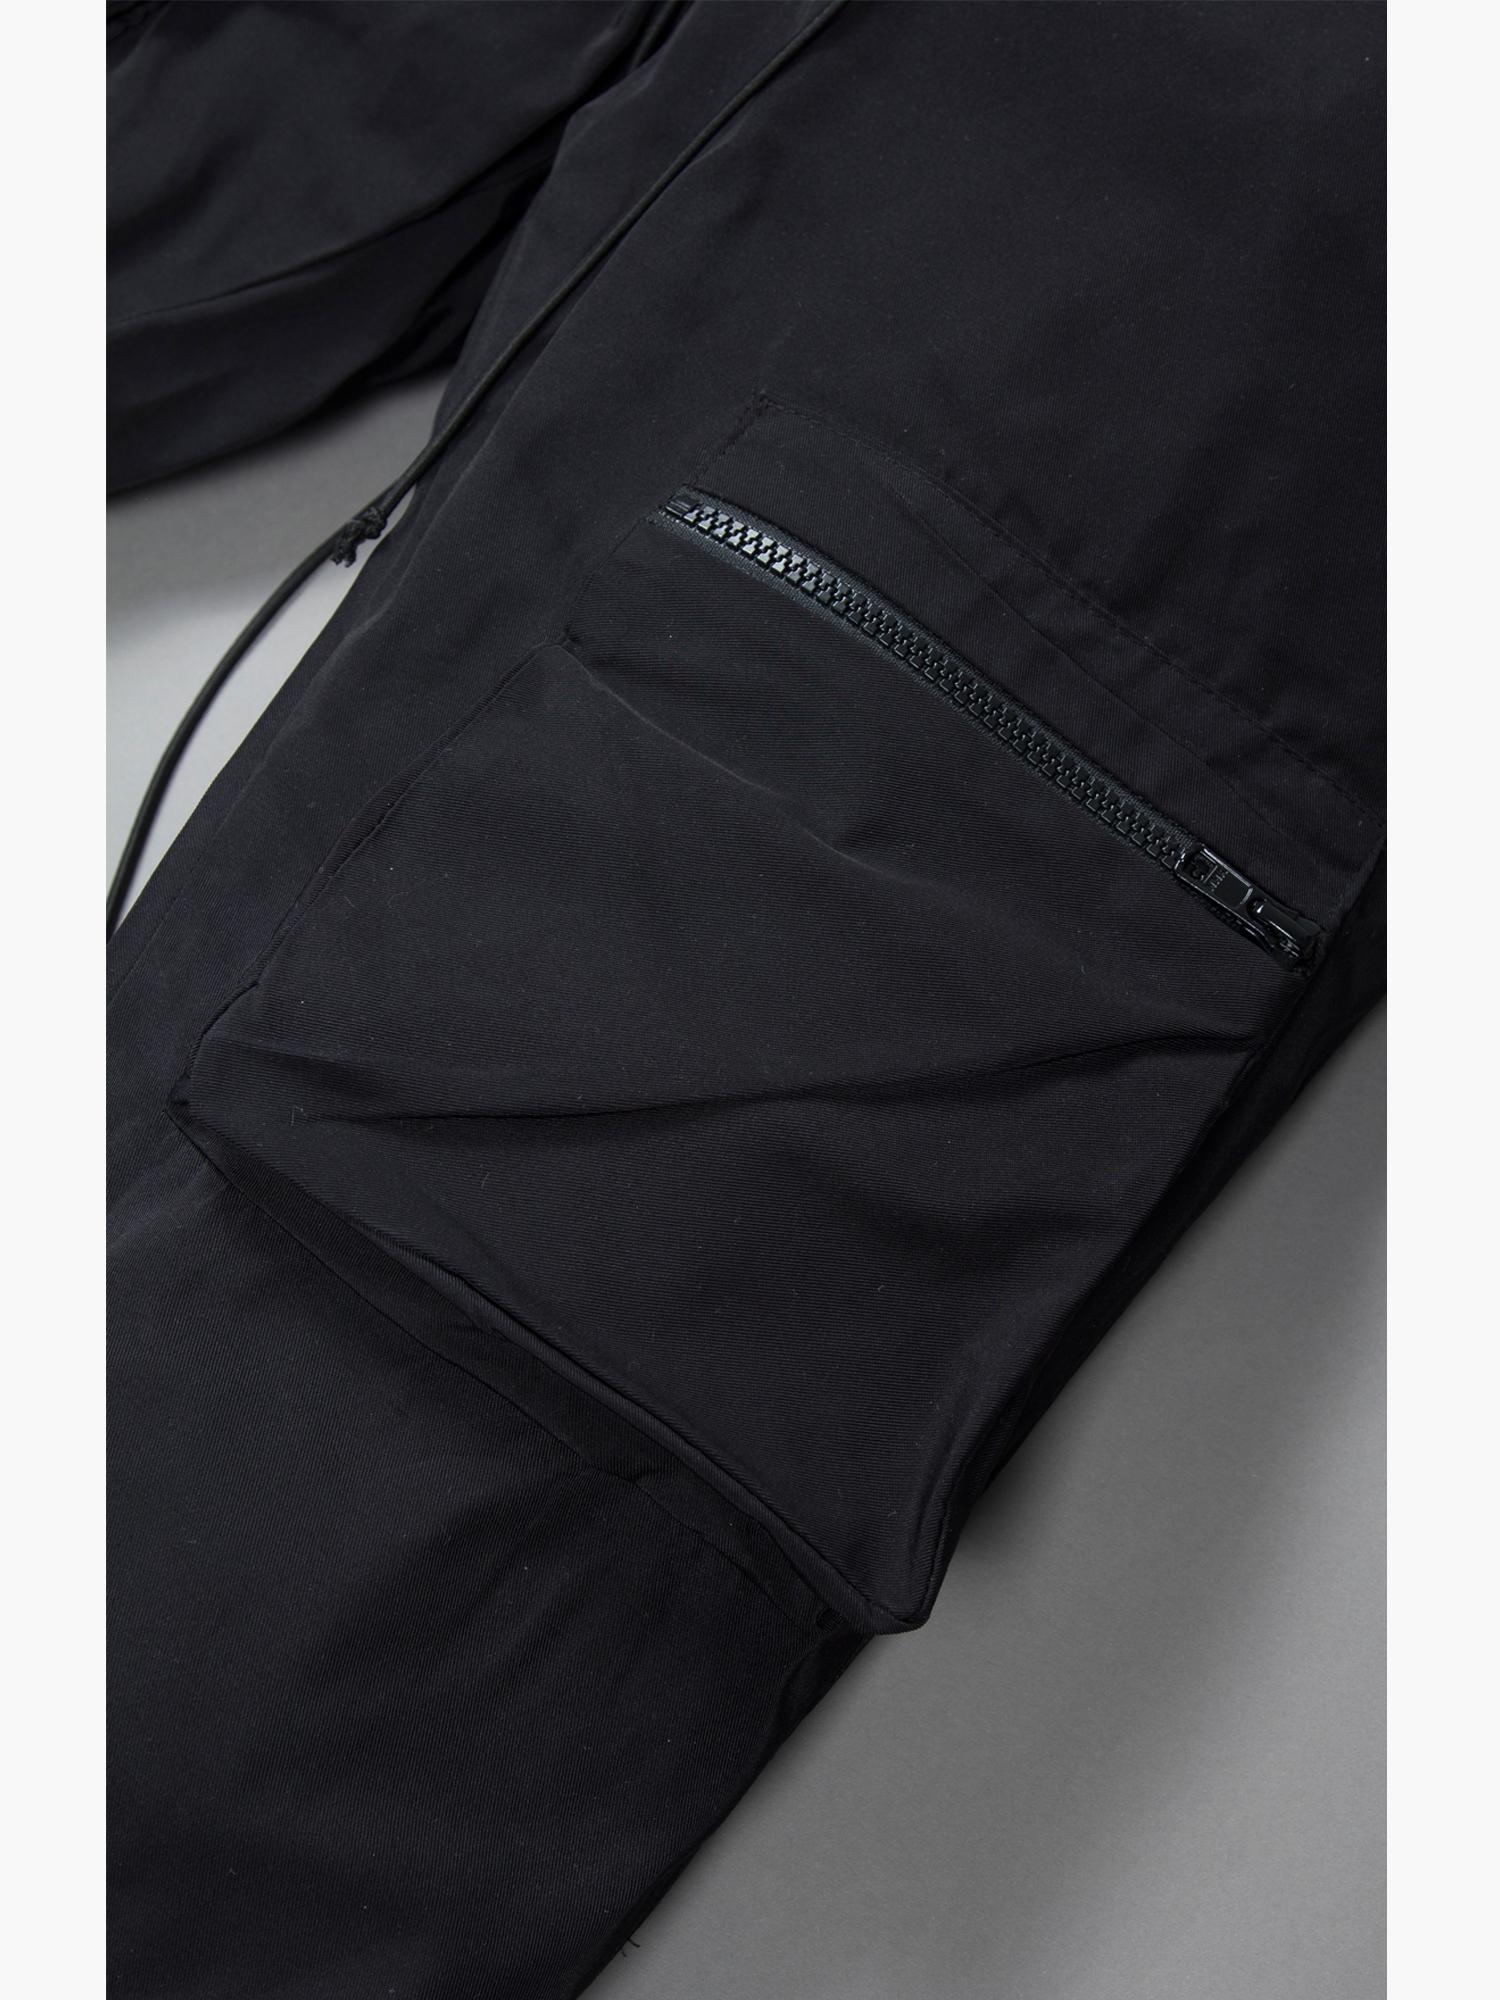 ATHRTY_cupid_pants_black_f2